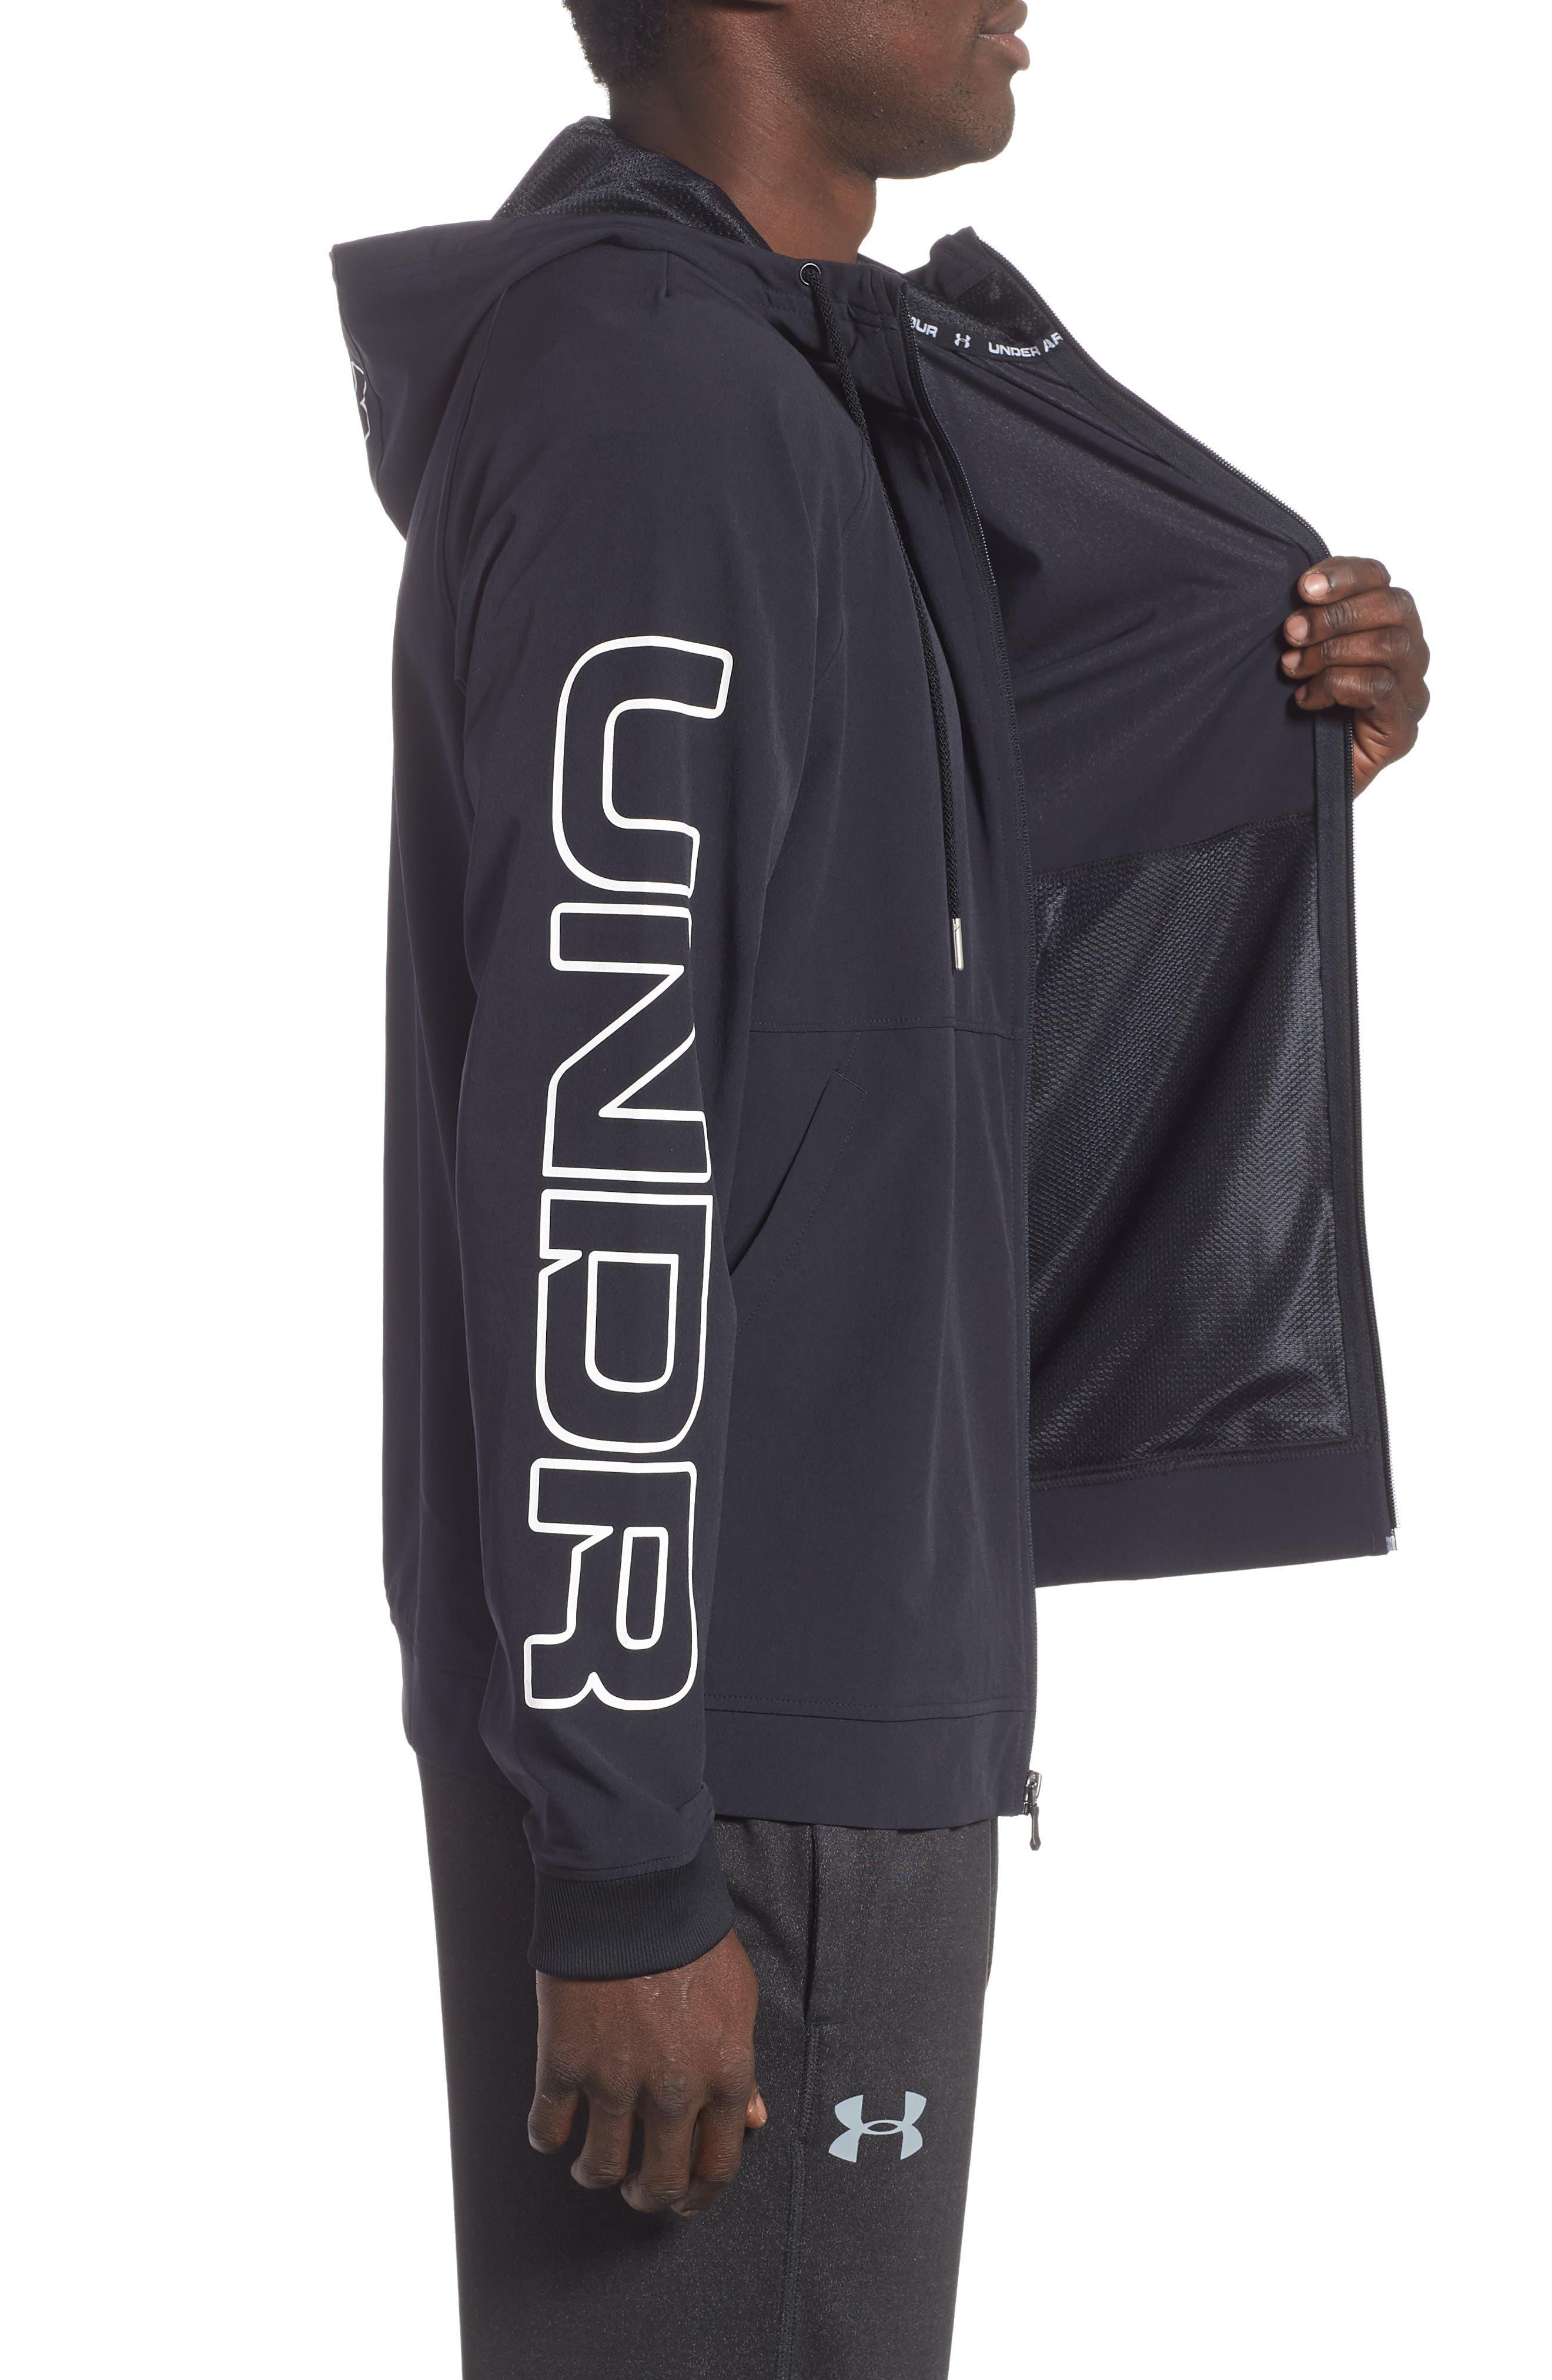 UNDER ARMOUR, Baseline Hooded Jacket, Alternate thumbnail 4, color, 001